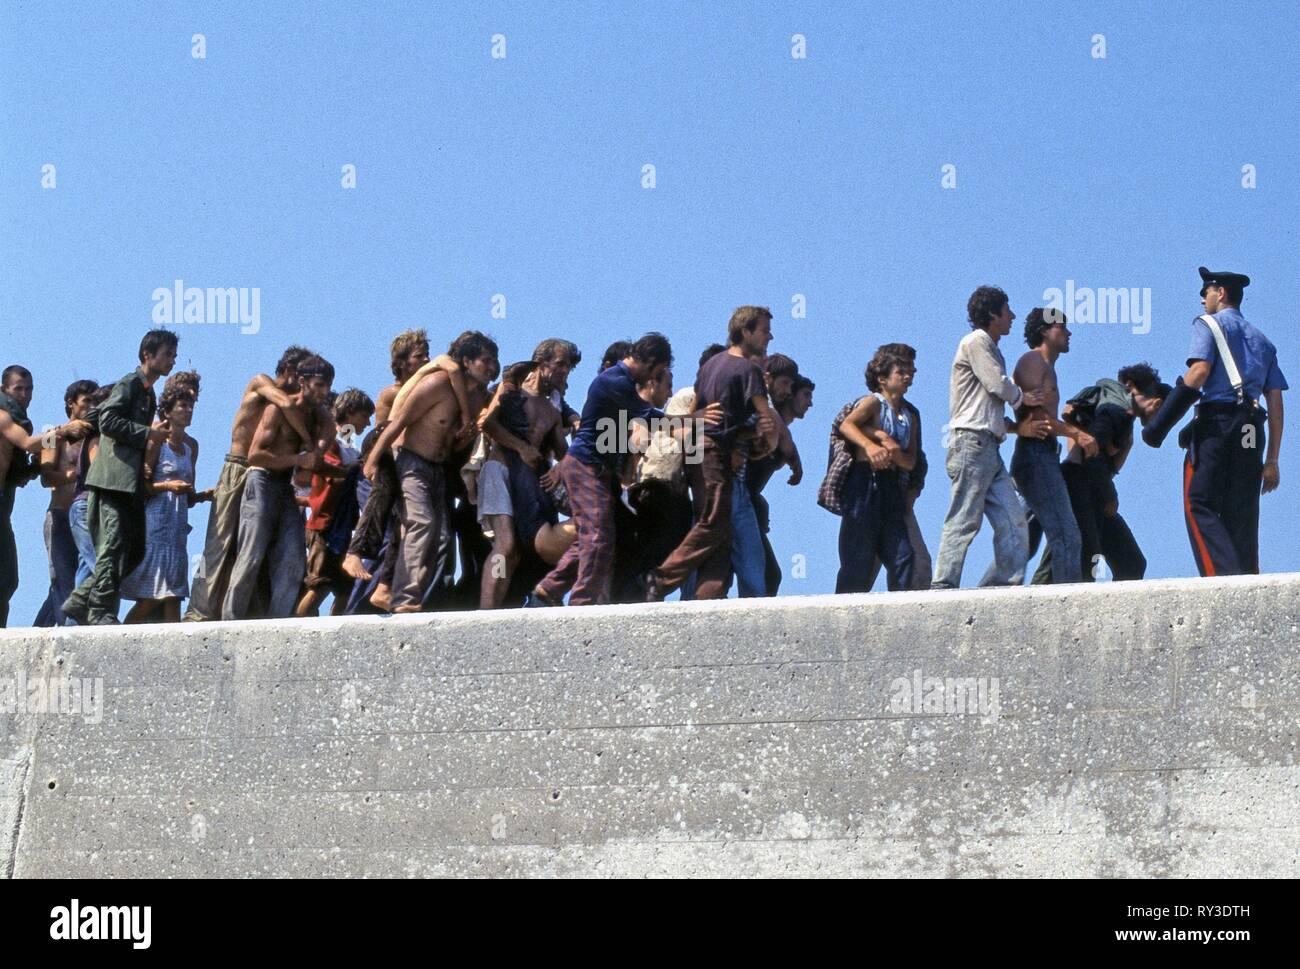 ALBANIAN MIGRANTS, LA NAVE DOLCE, 2012 - Stock Image